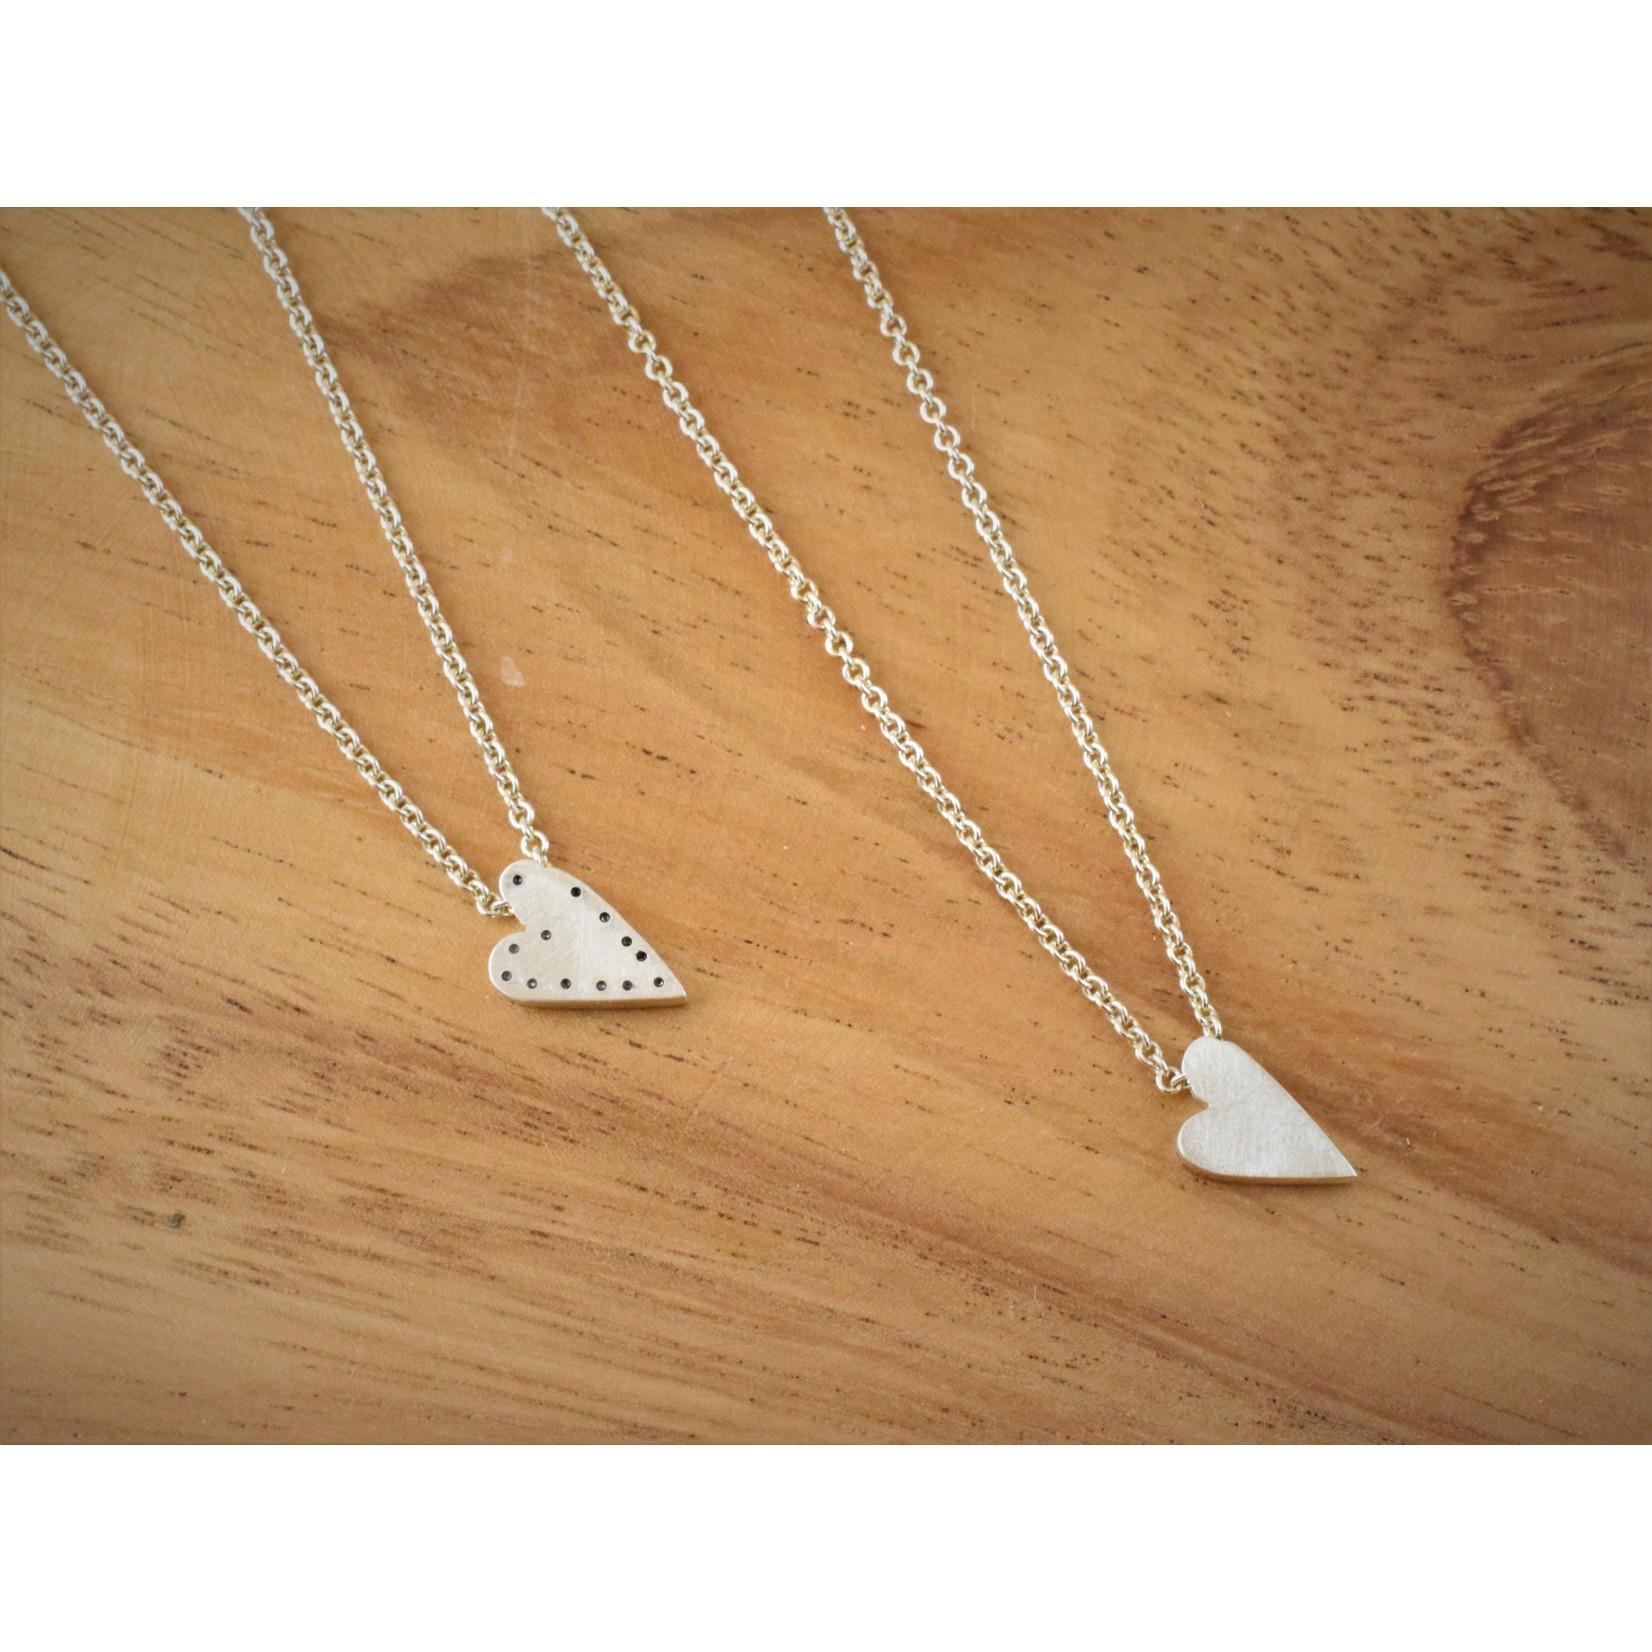 Hartley Studio Sterling Textured Handmade Heart Necklace